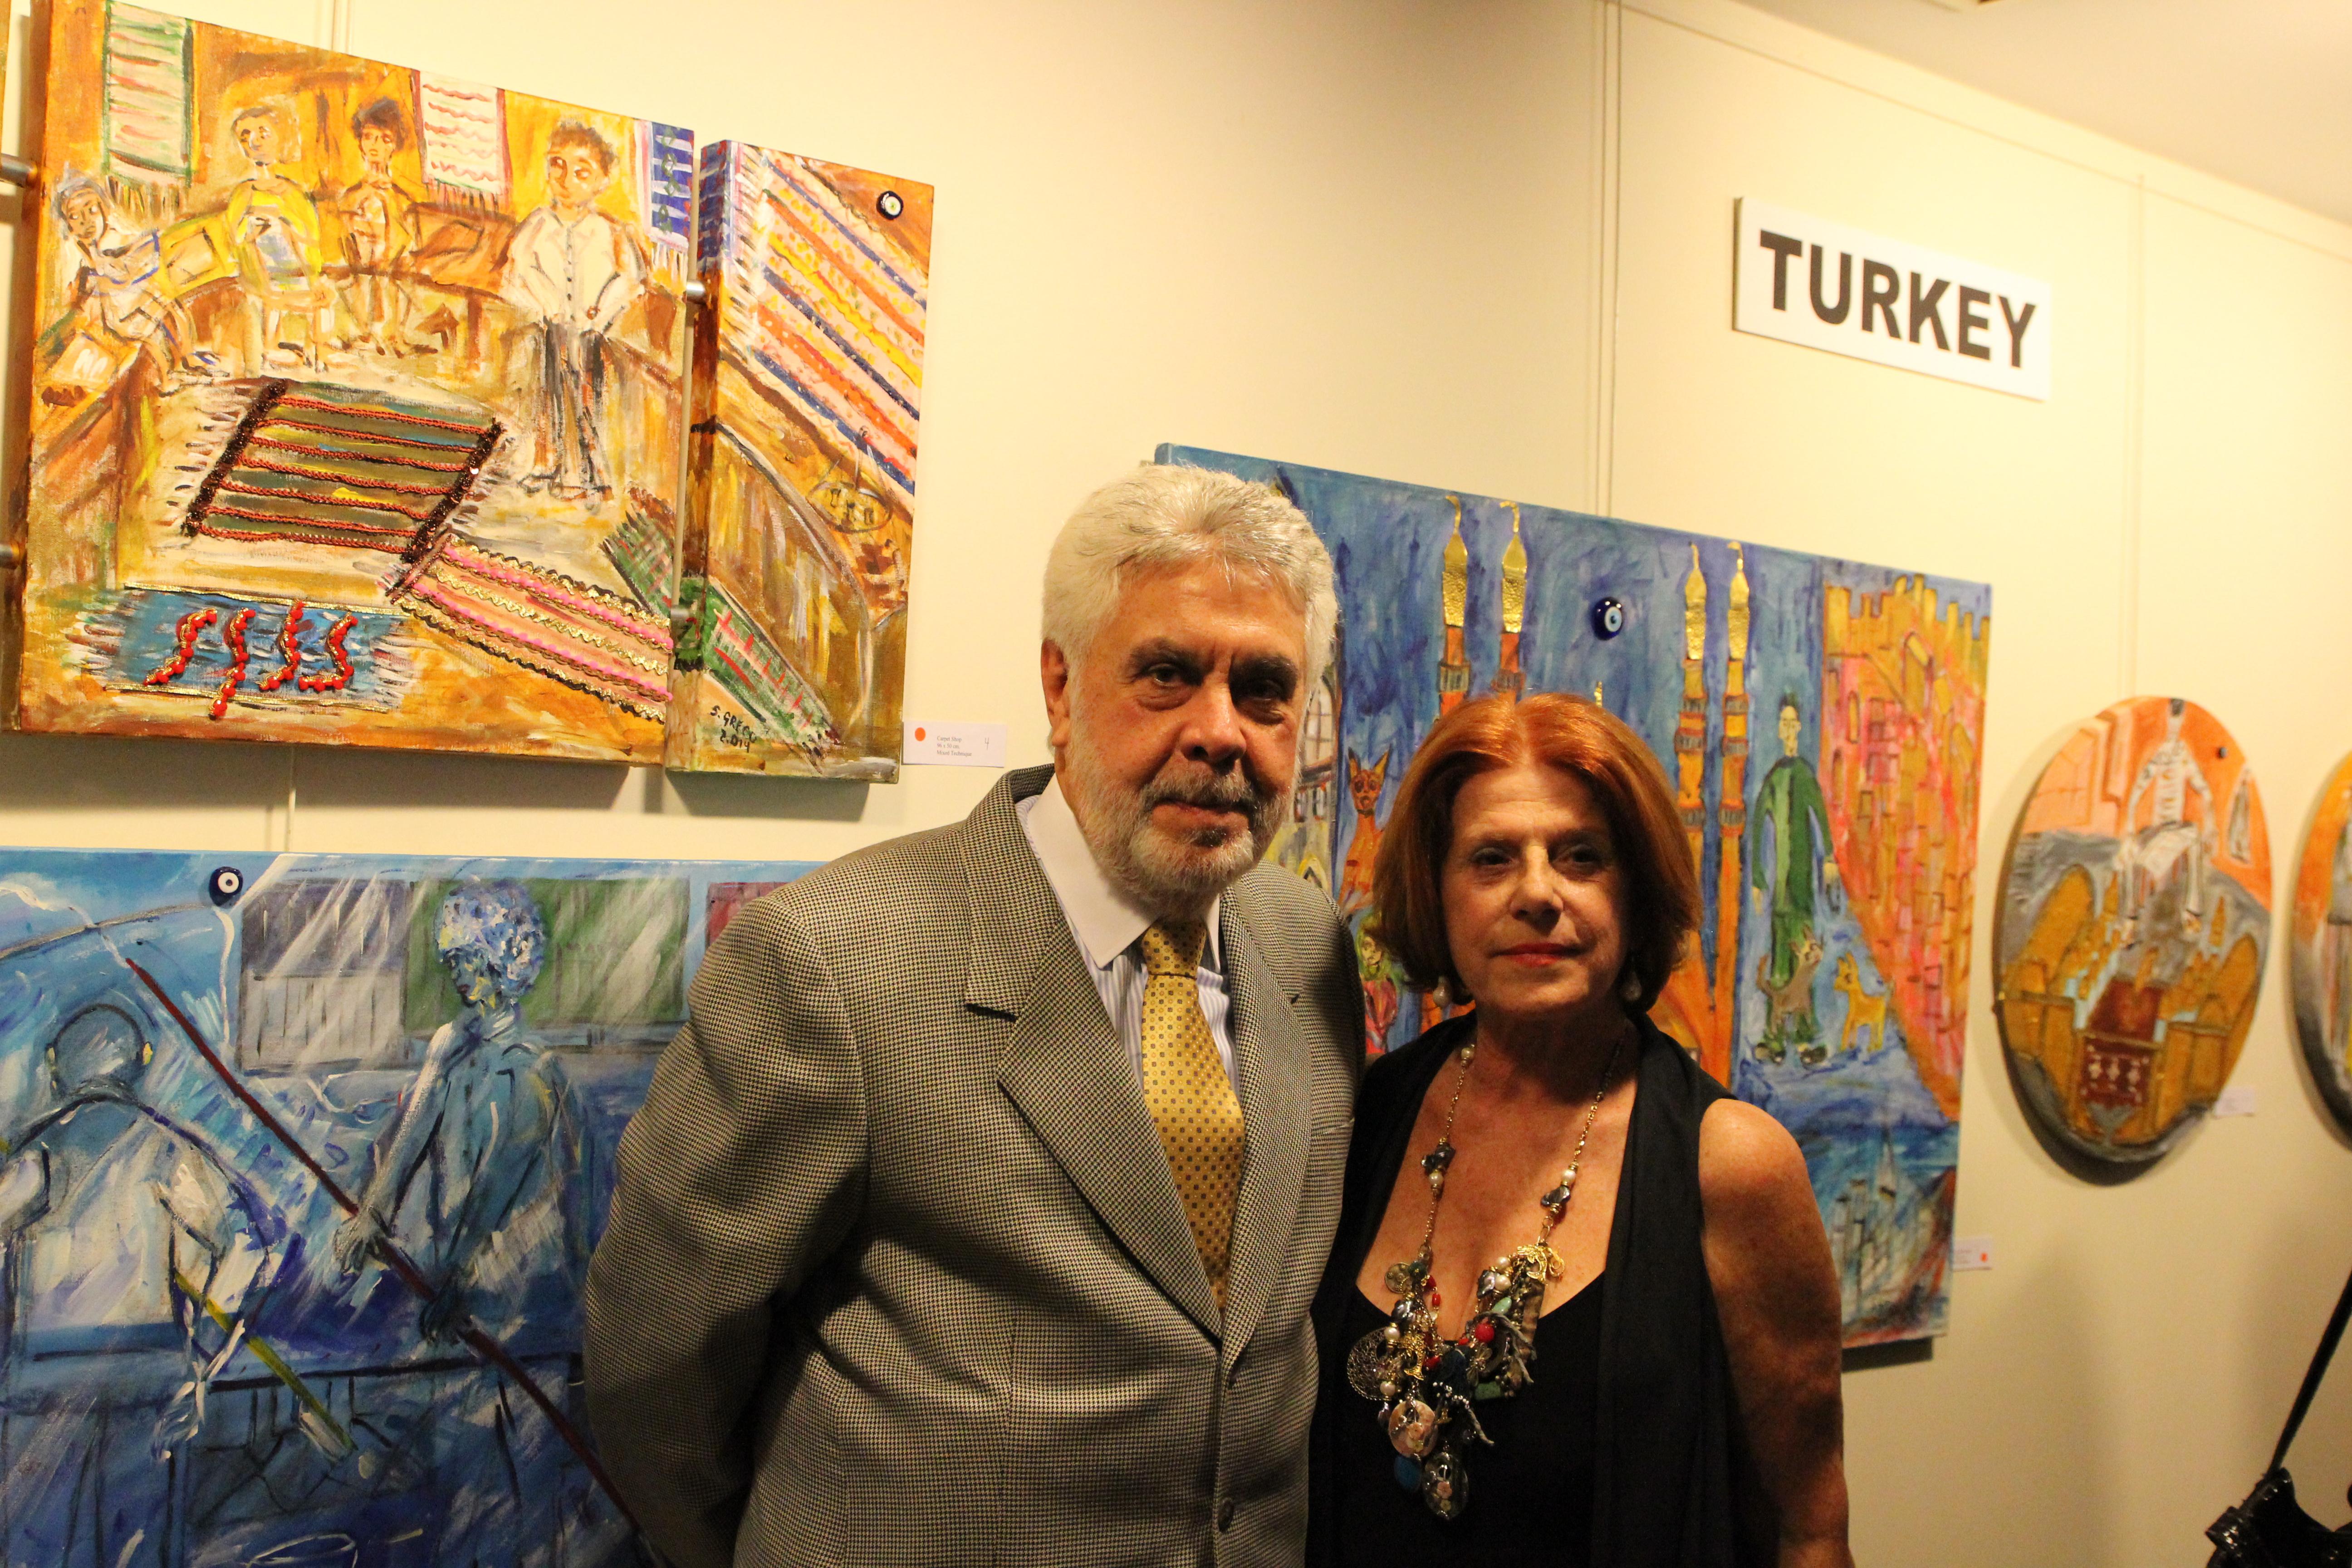 istanbul peinte par une ambassadrice br silienne aujourd 39 hui la turquieaujourd 39 hui la turquie. Black Bedroom Furniture Sets. Home Design Ideas